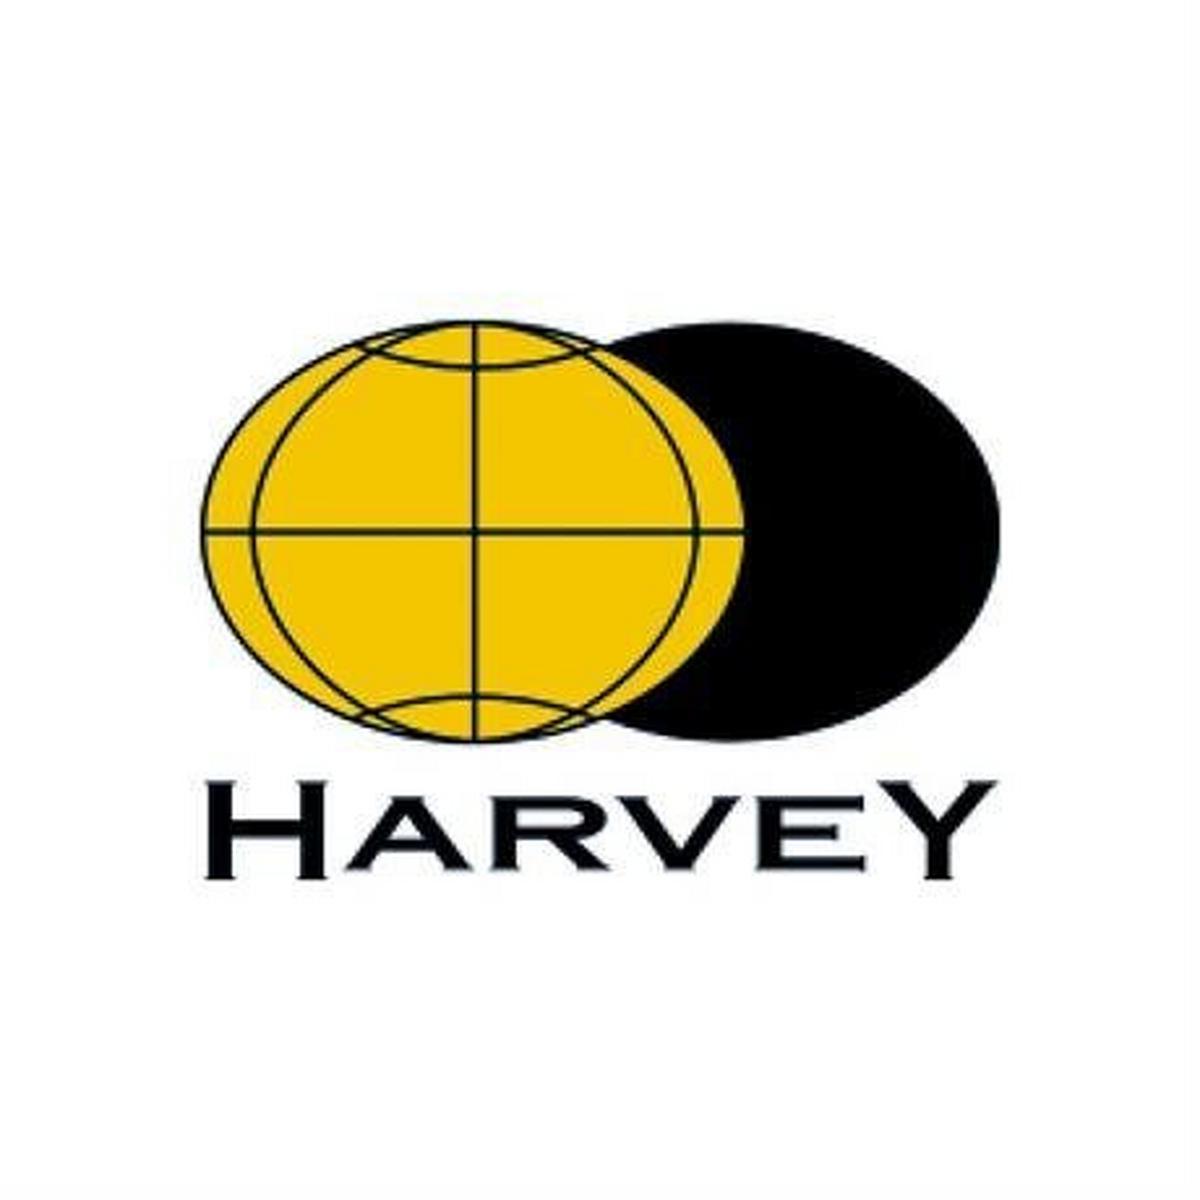 Harveys Harvey Maps Lake District Playing Cards